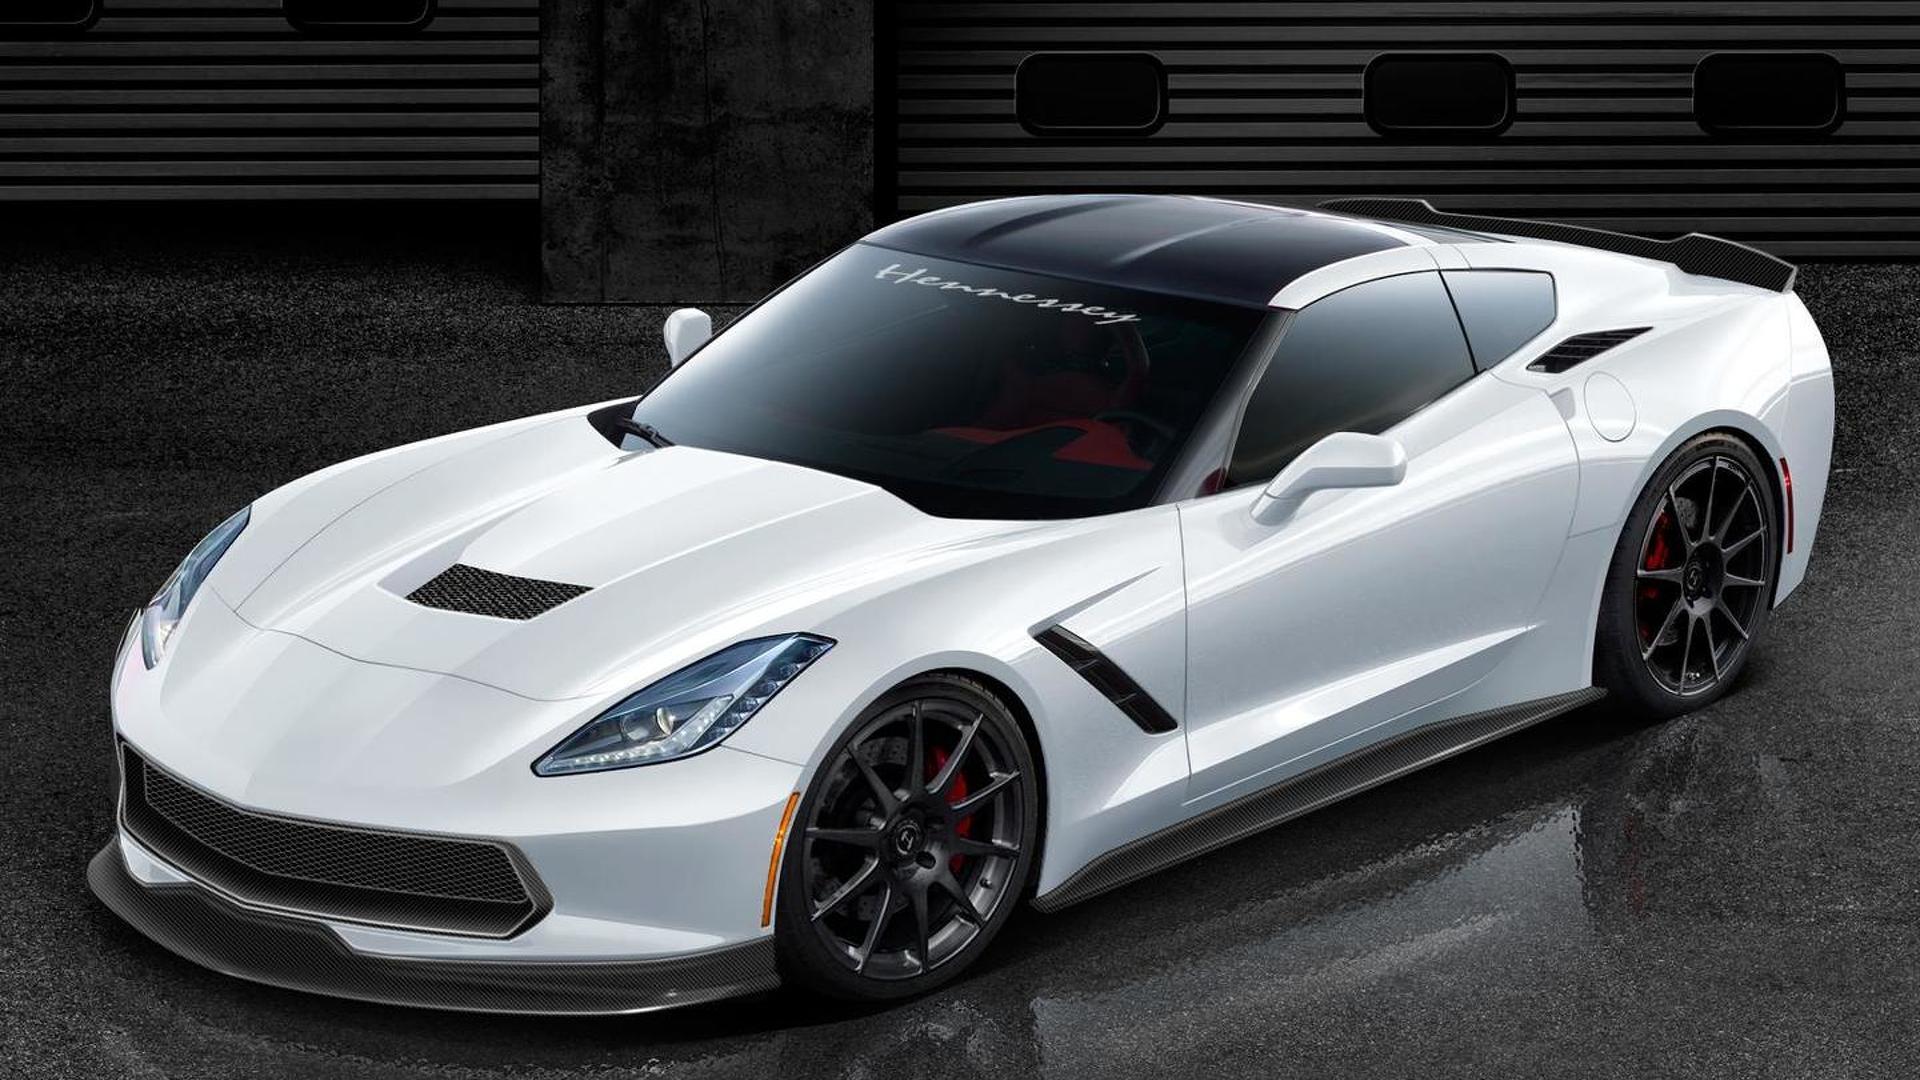 Hennessey details their tuning program for the Corvette Stingray